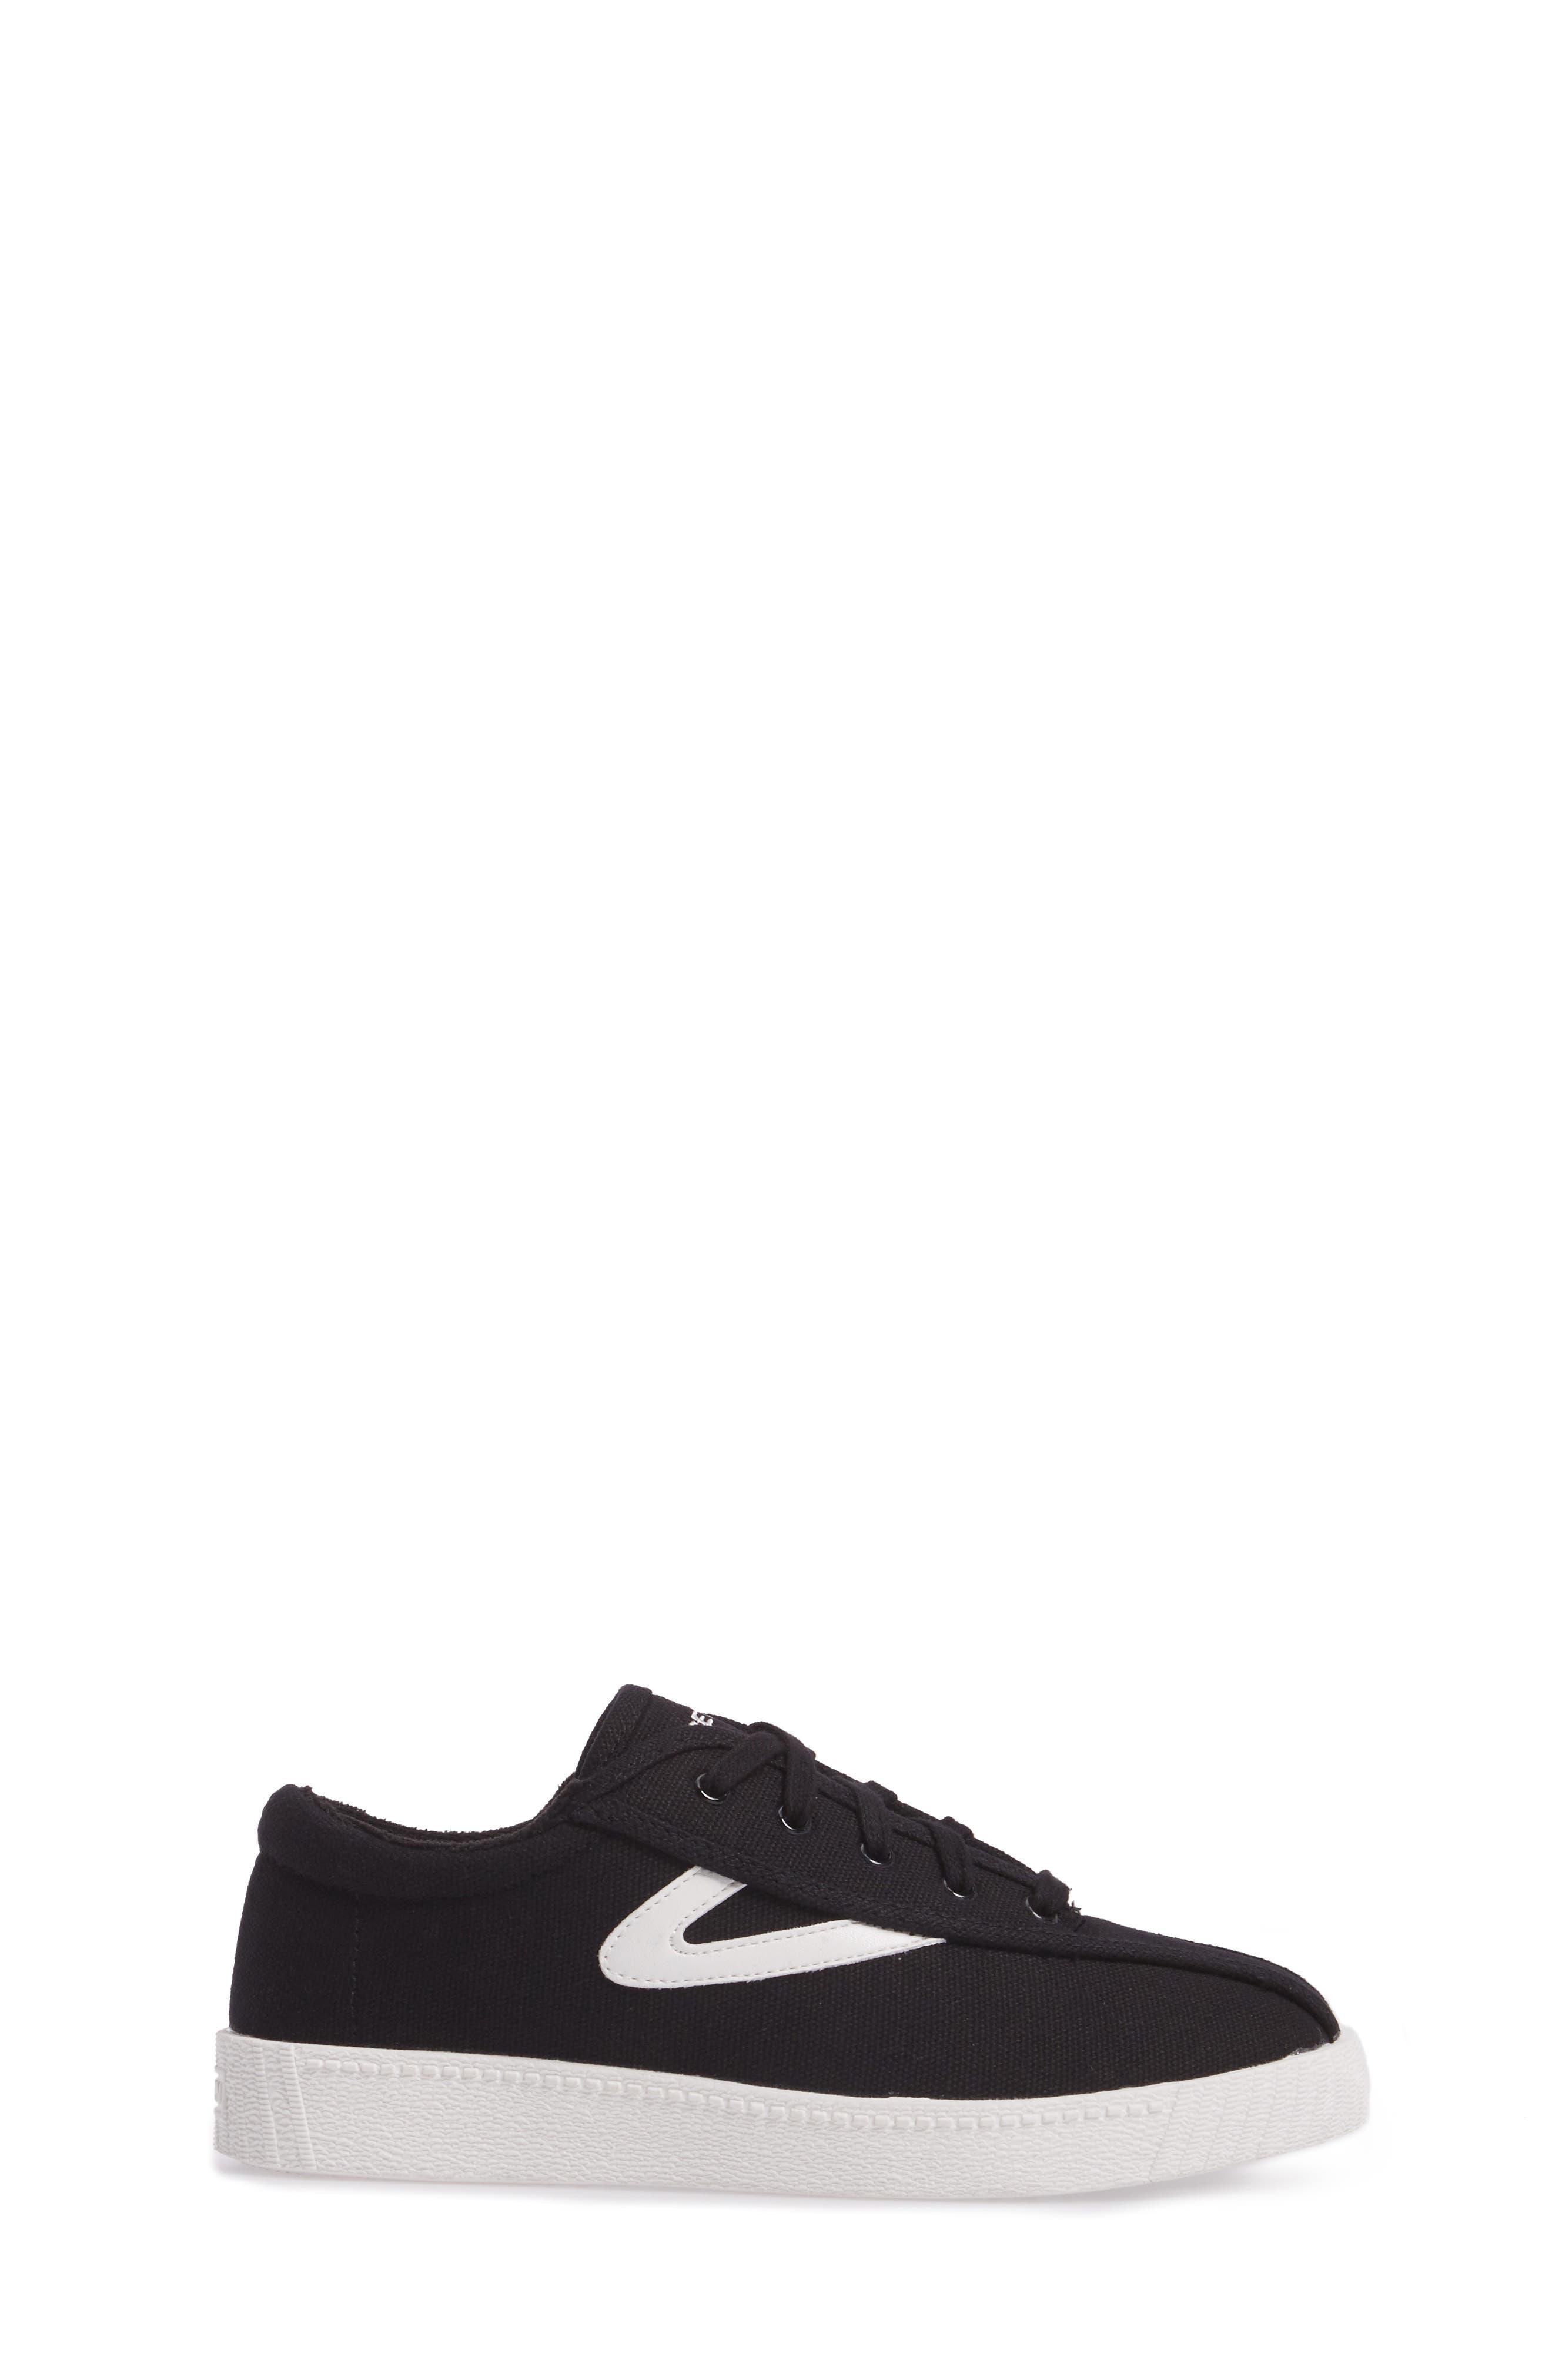 TRETORN, Nylite Plus Sneaker, Alternate thumbnail 3, color, 012